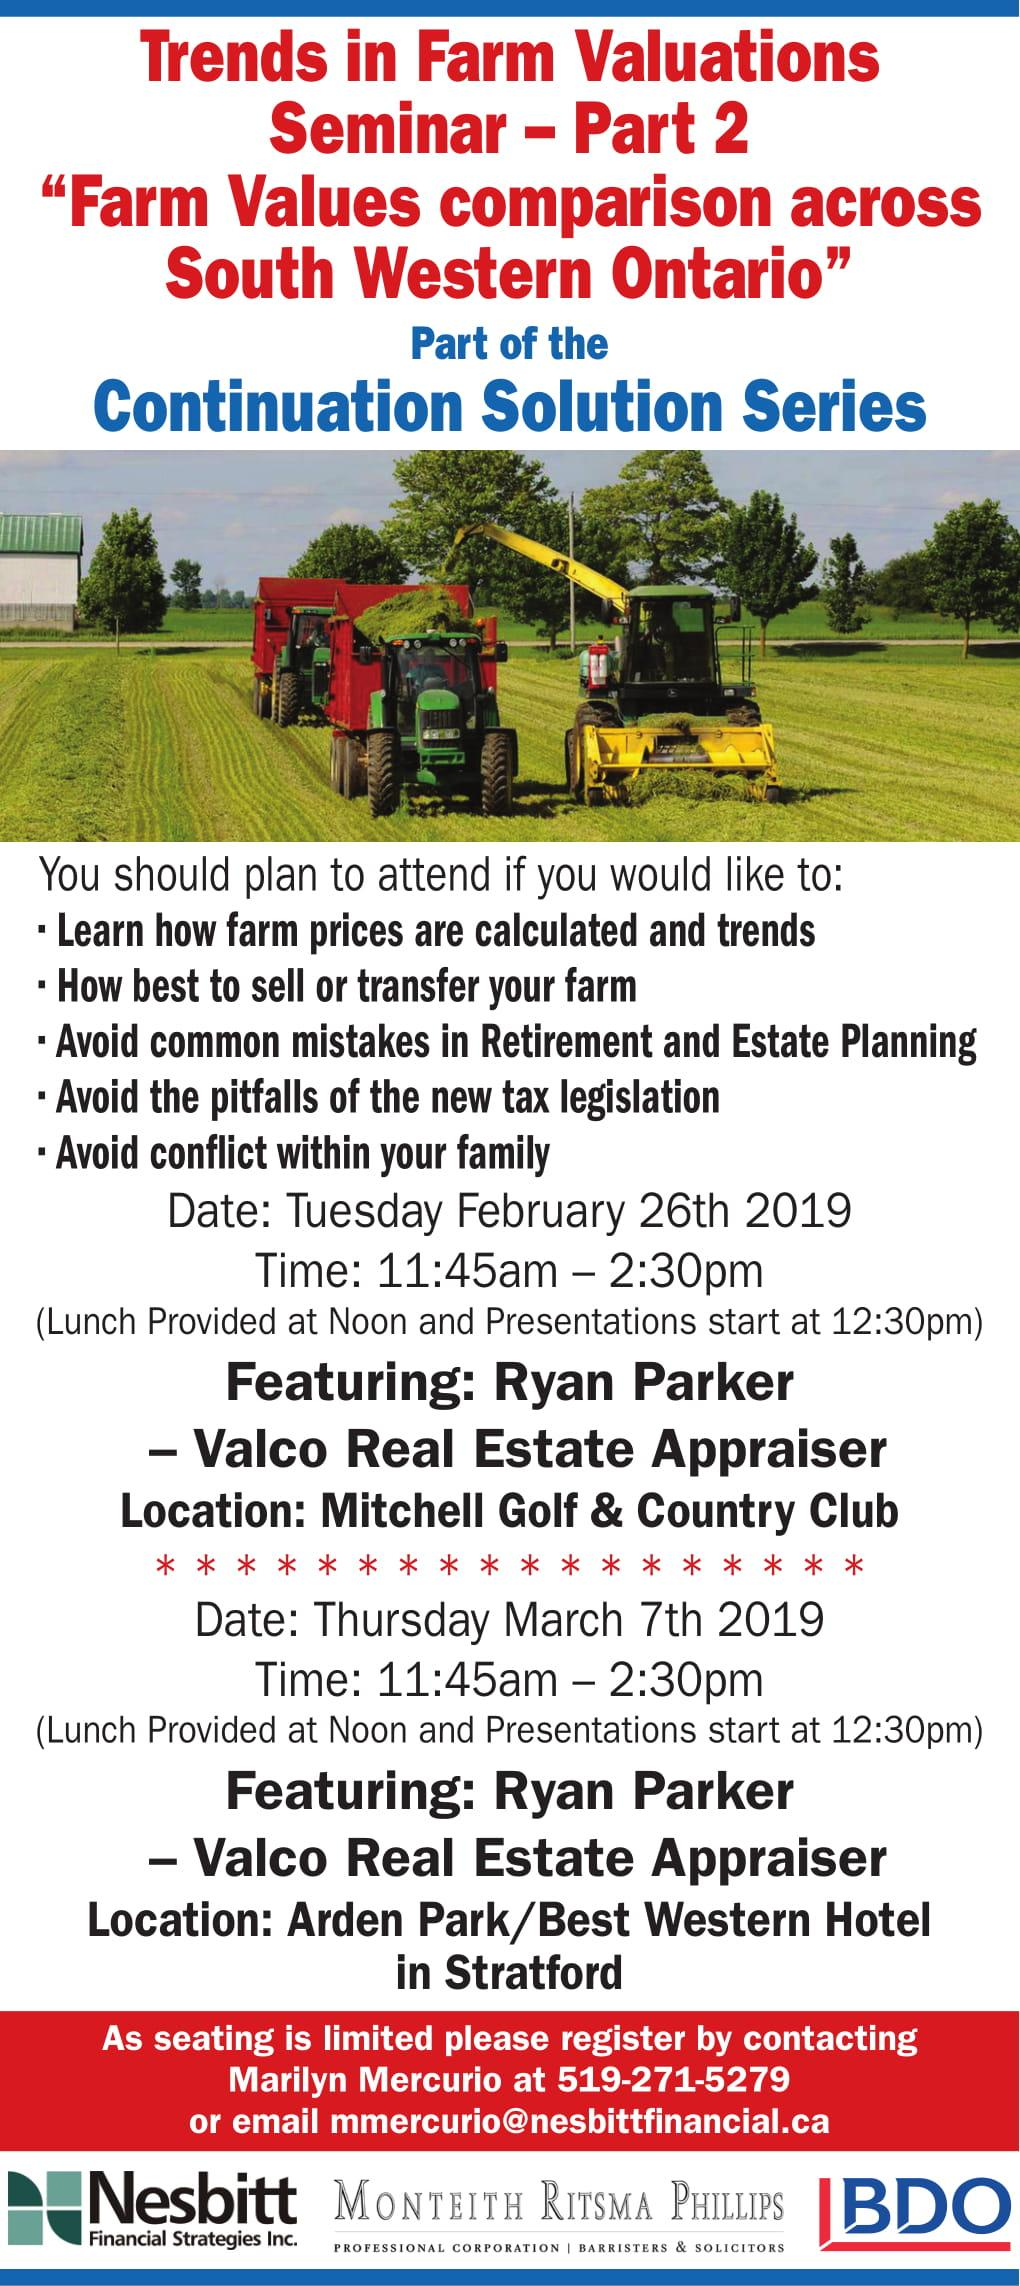 Trends in Farm Valuations Seminar - Part 2 Thumbnail